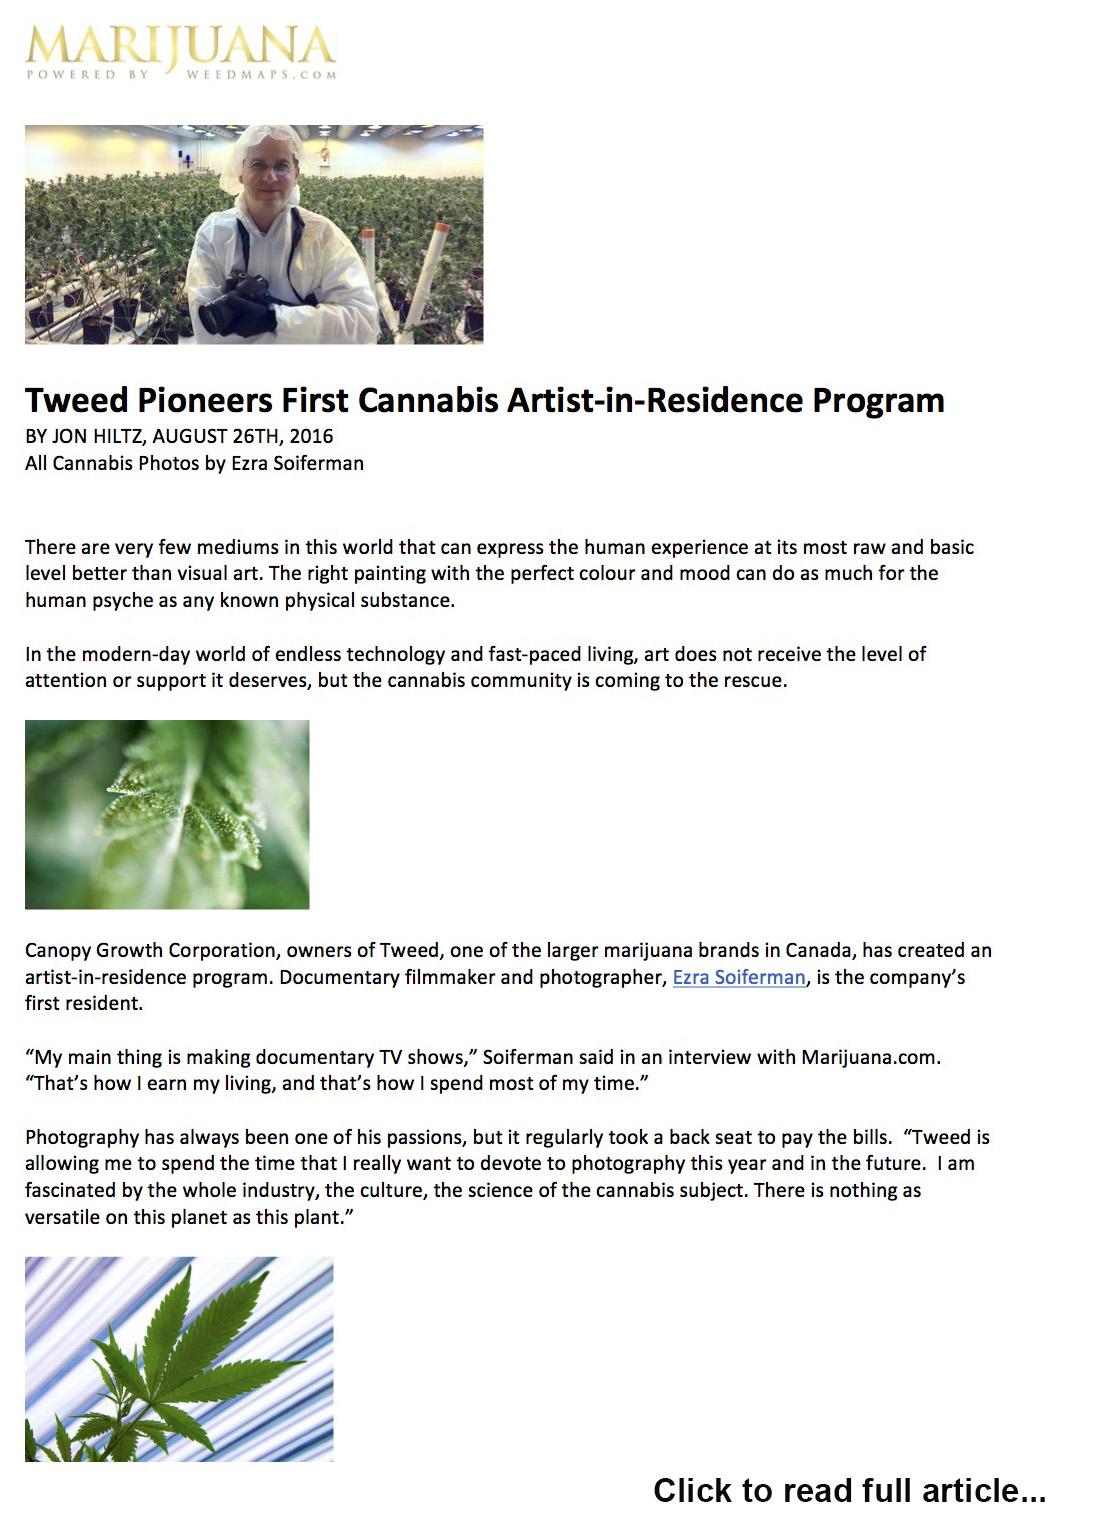 Tweed Artist-in-Residence - Marijuana.com feature story, 2016.